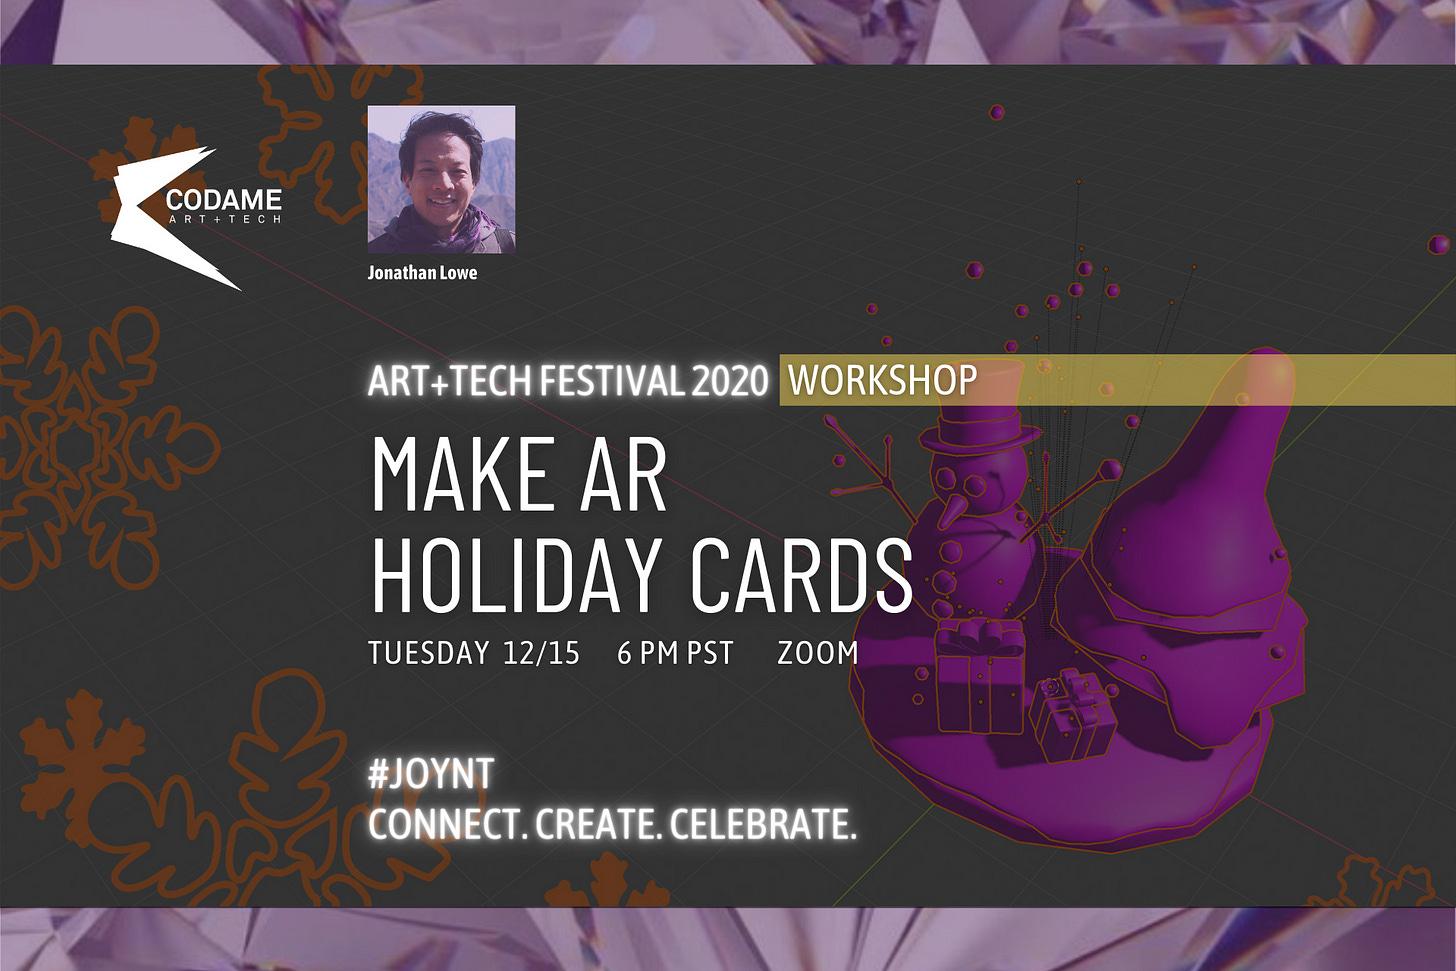 Make AR Holiday Cards